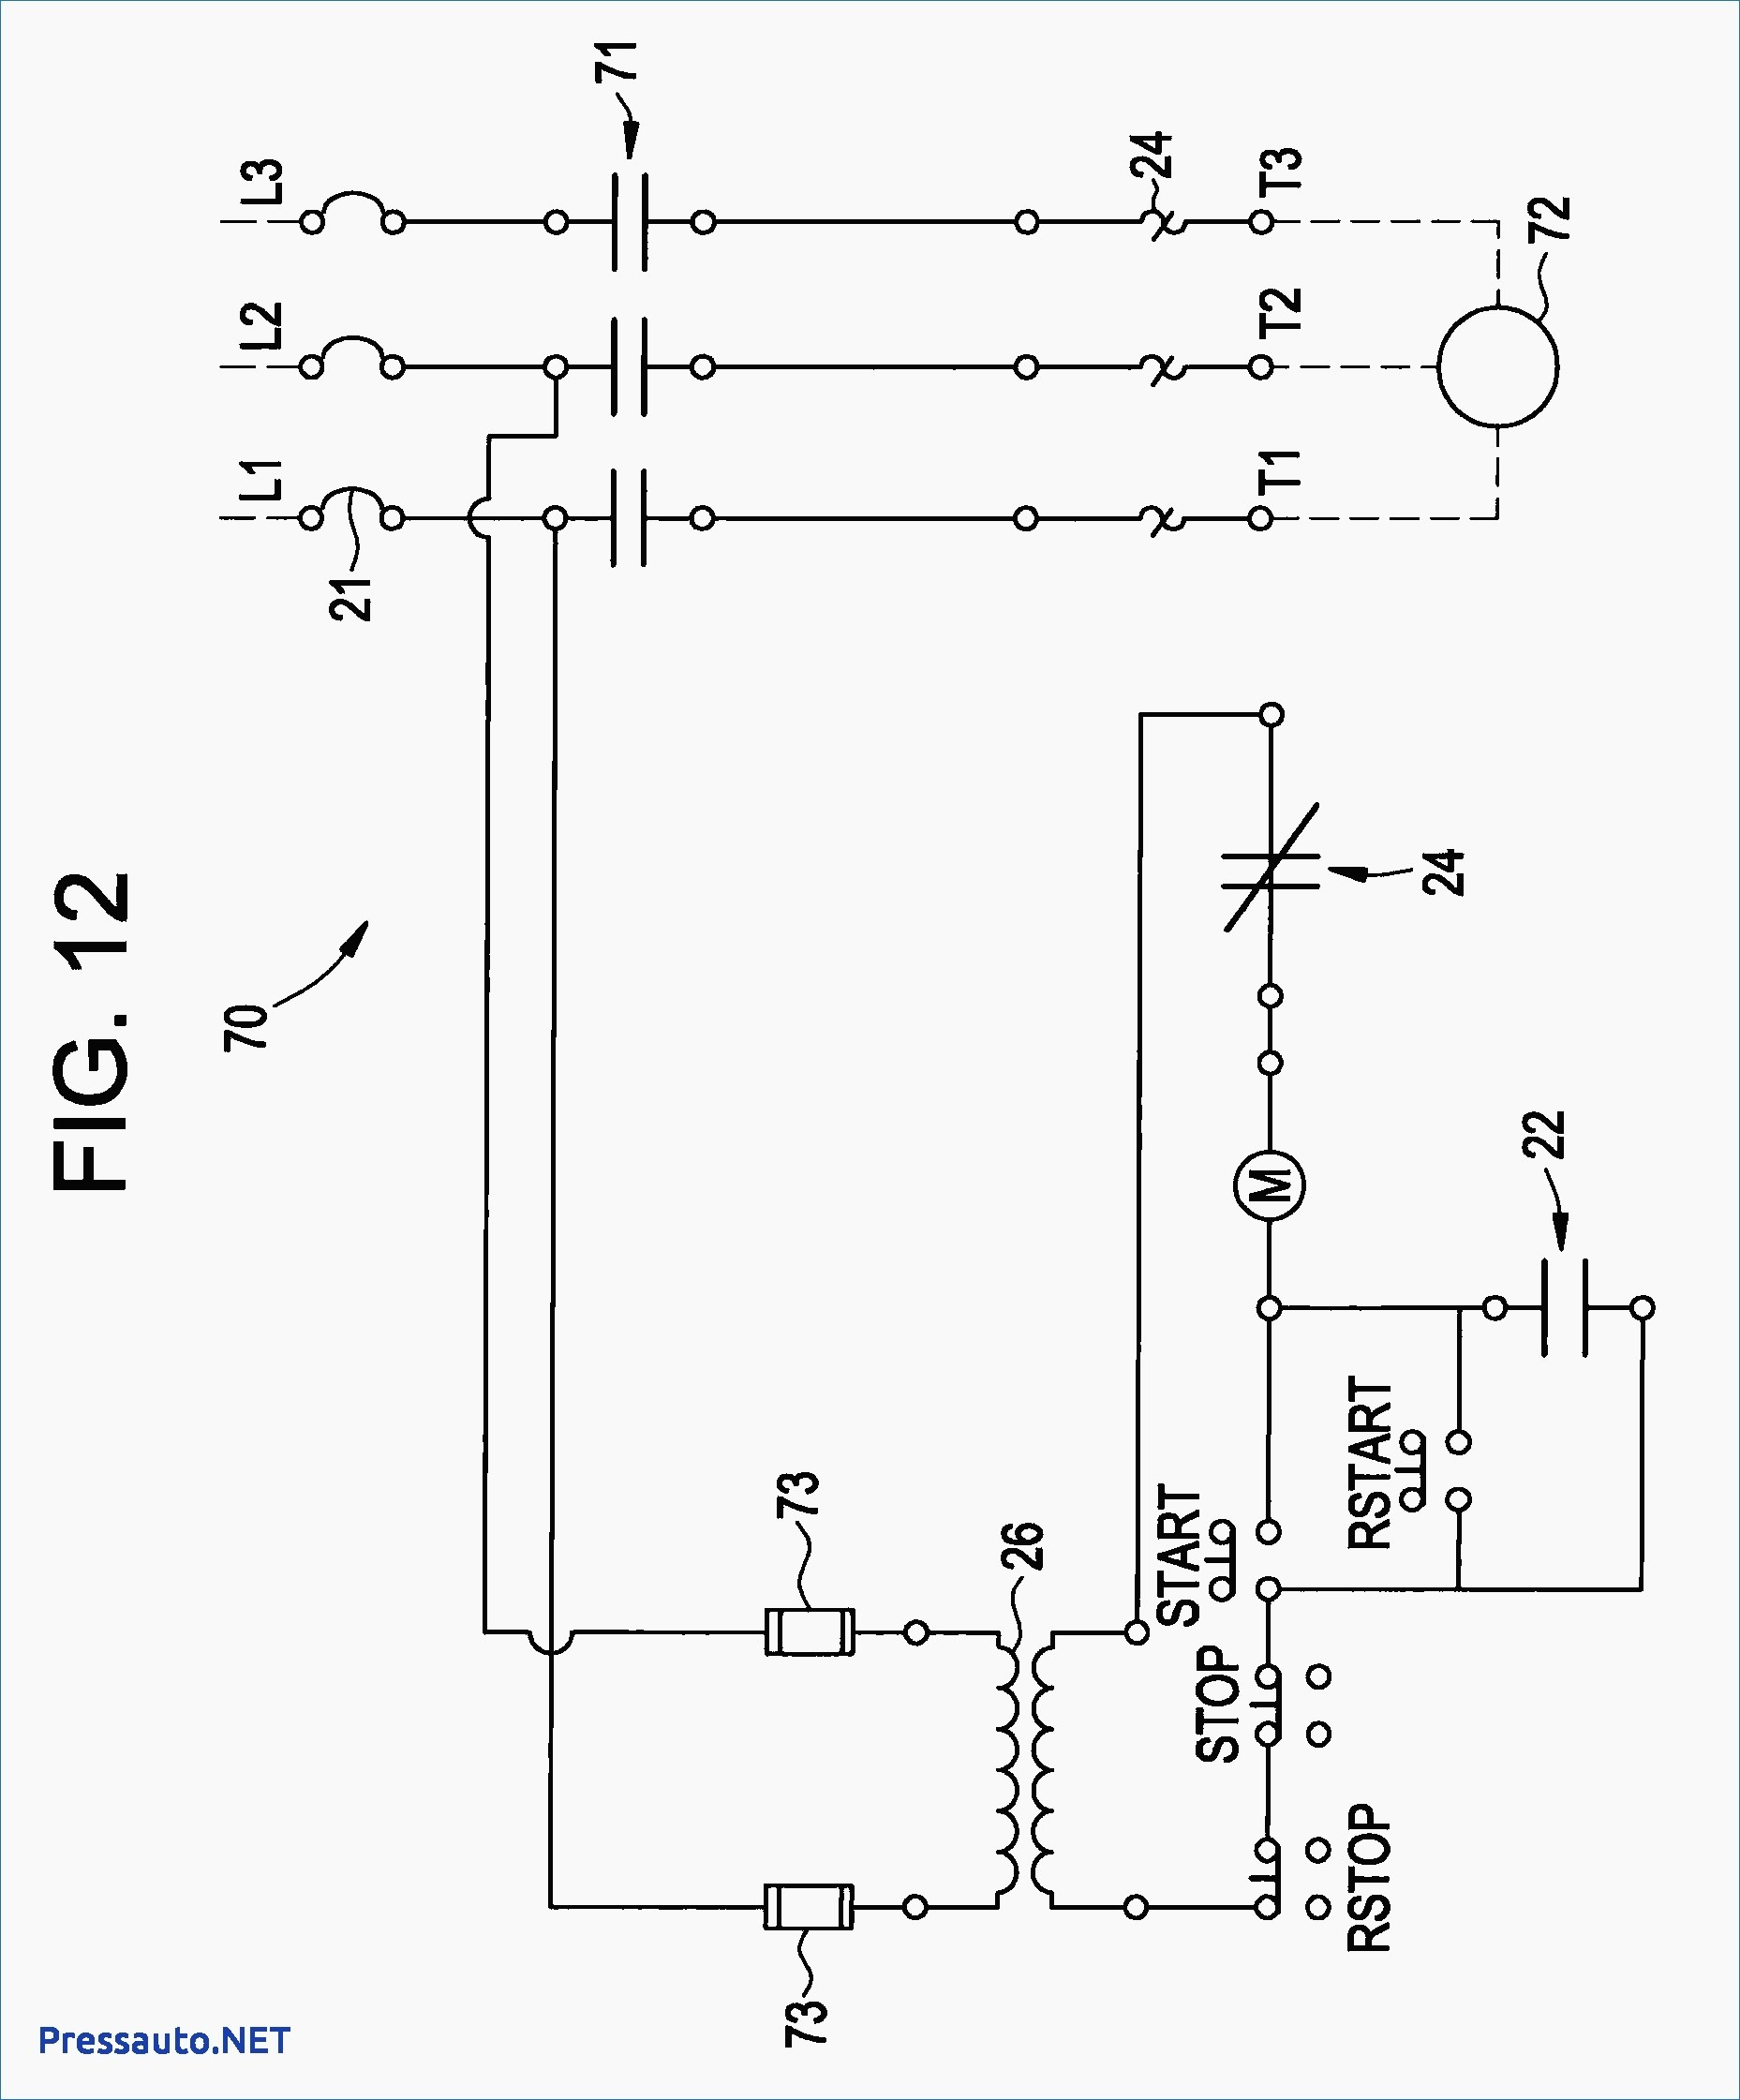 hight resolution of reversing starter wiring diagram